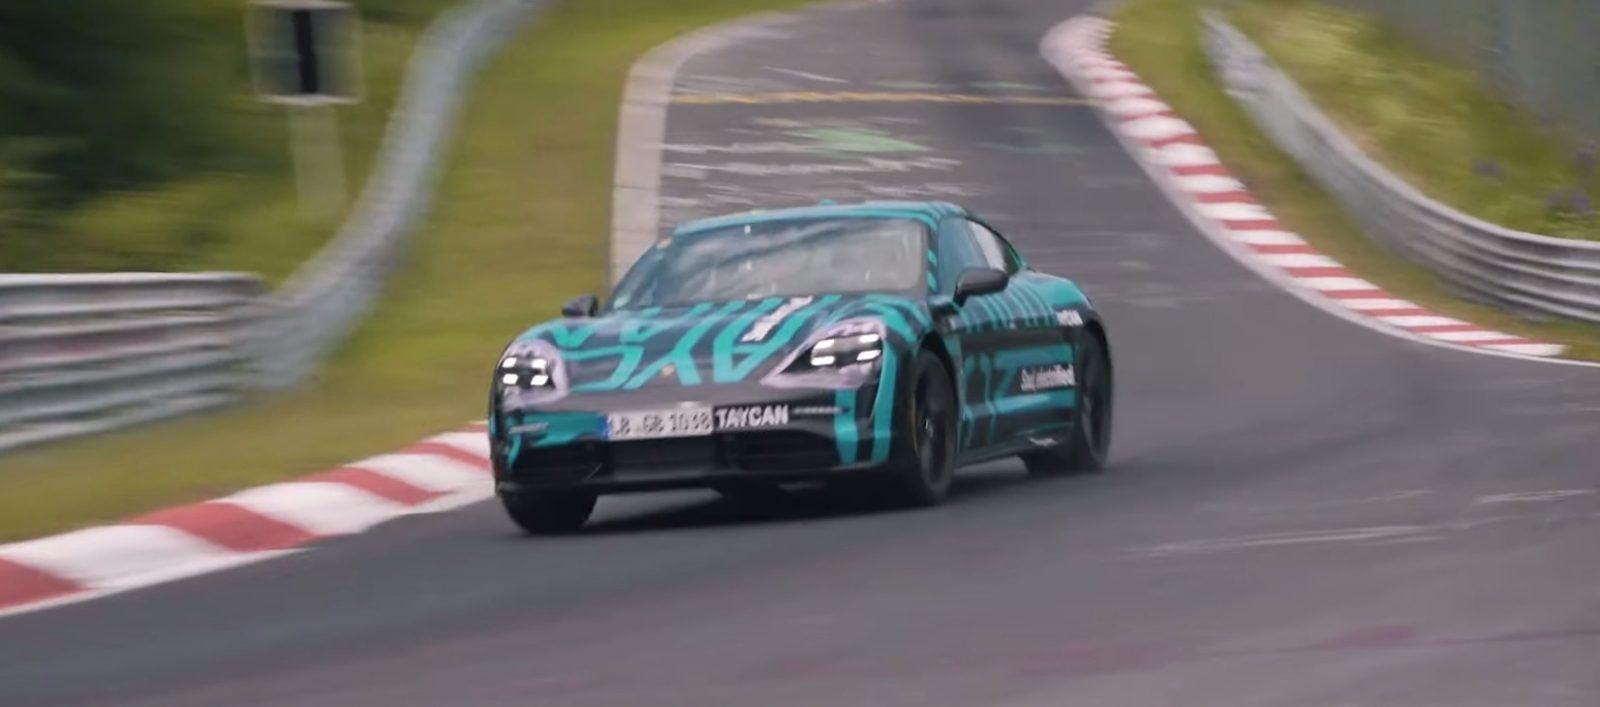 Image result for porsche taycan nurburgring